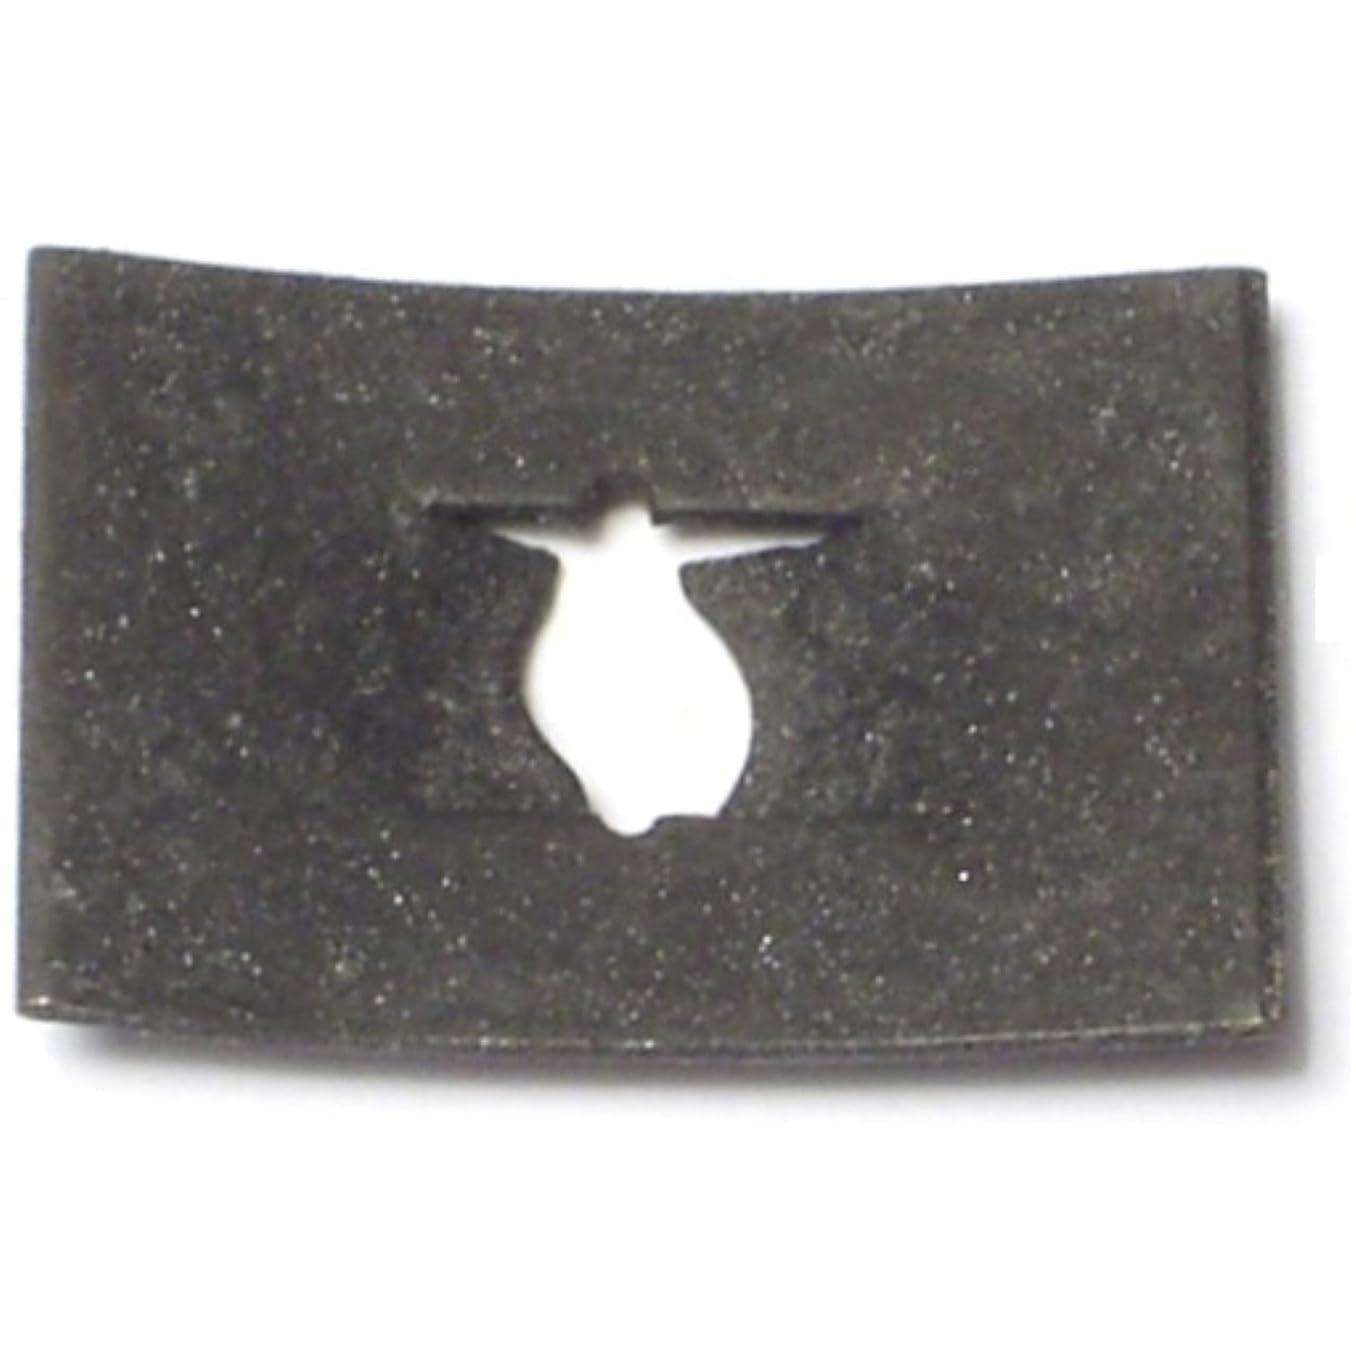 Hard-to-Find Fastener 014973324377 Flat Speed Nuts for Sheet Metal Screws, 10, Piece-40